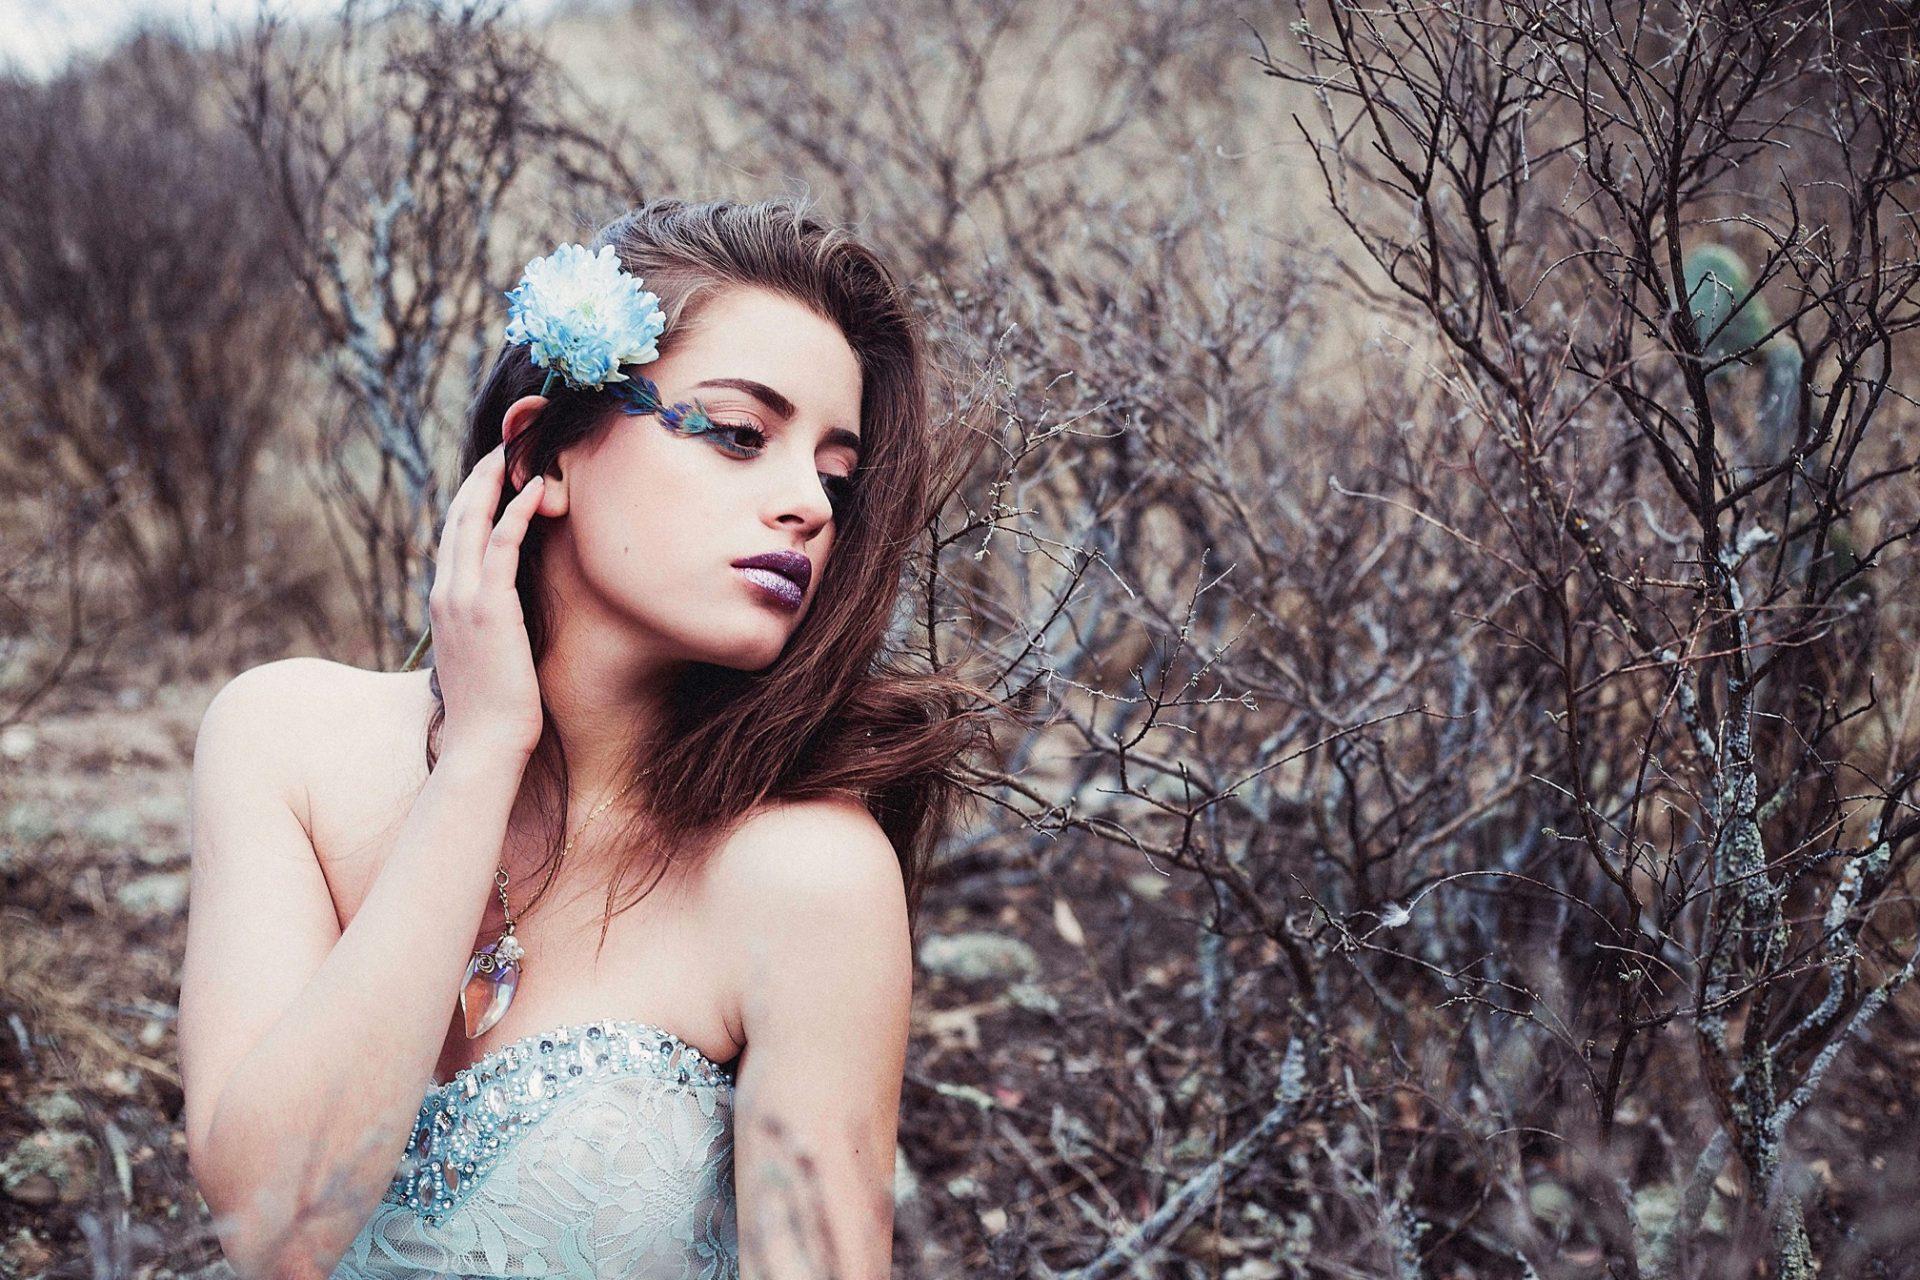 fotografo_profesional_zacatecas_sesion_casual_fashion-13